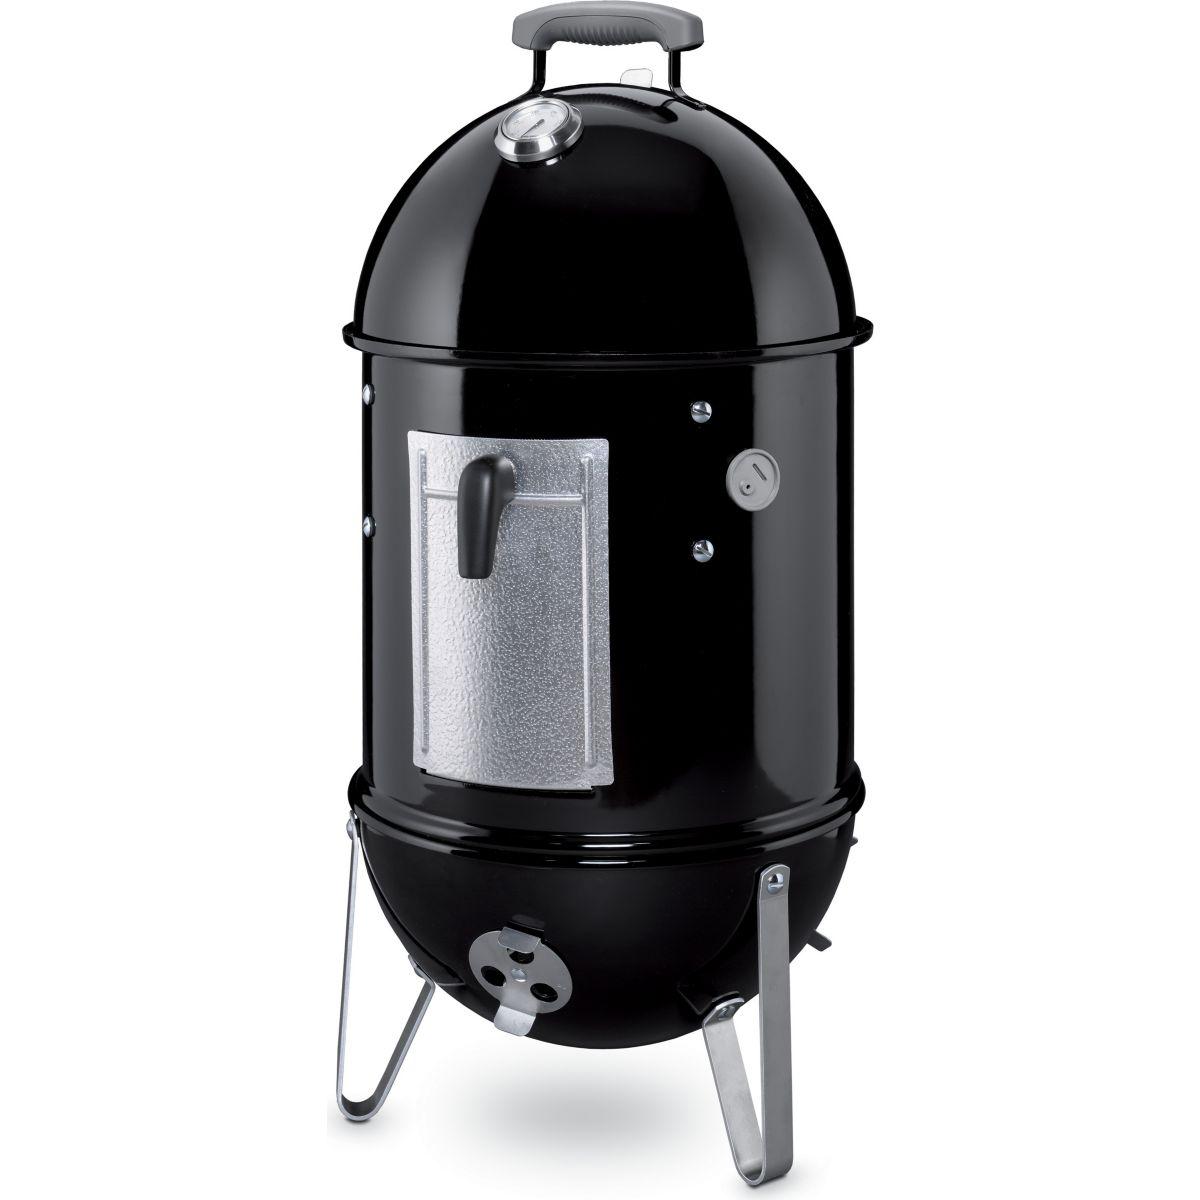 Barbecue WEBER SMOKEY MOUTAIN COOKER 37 (photo)